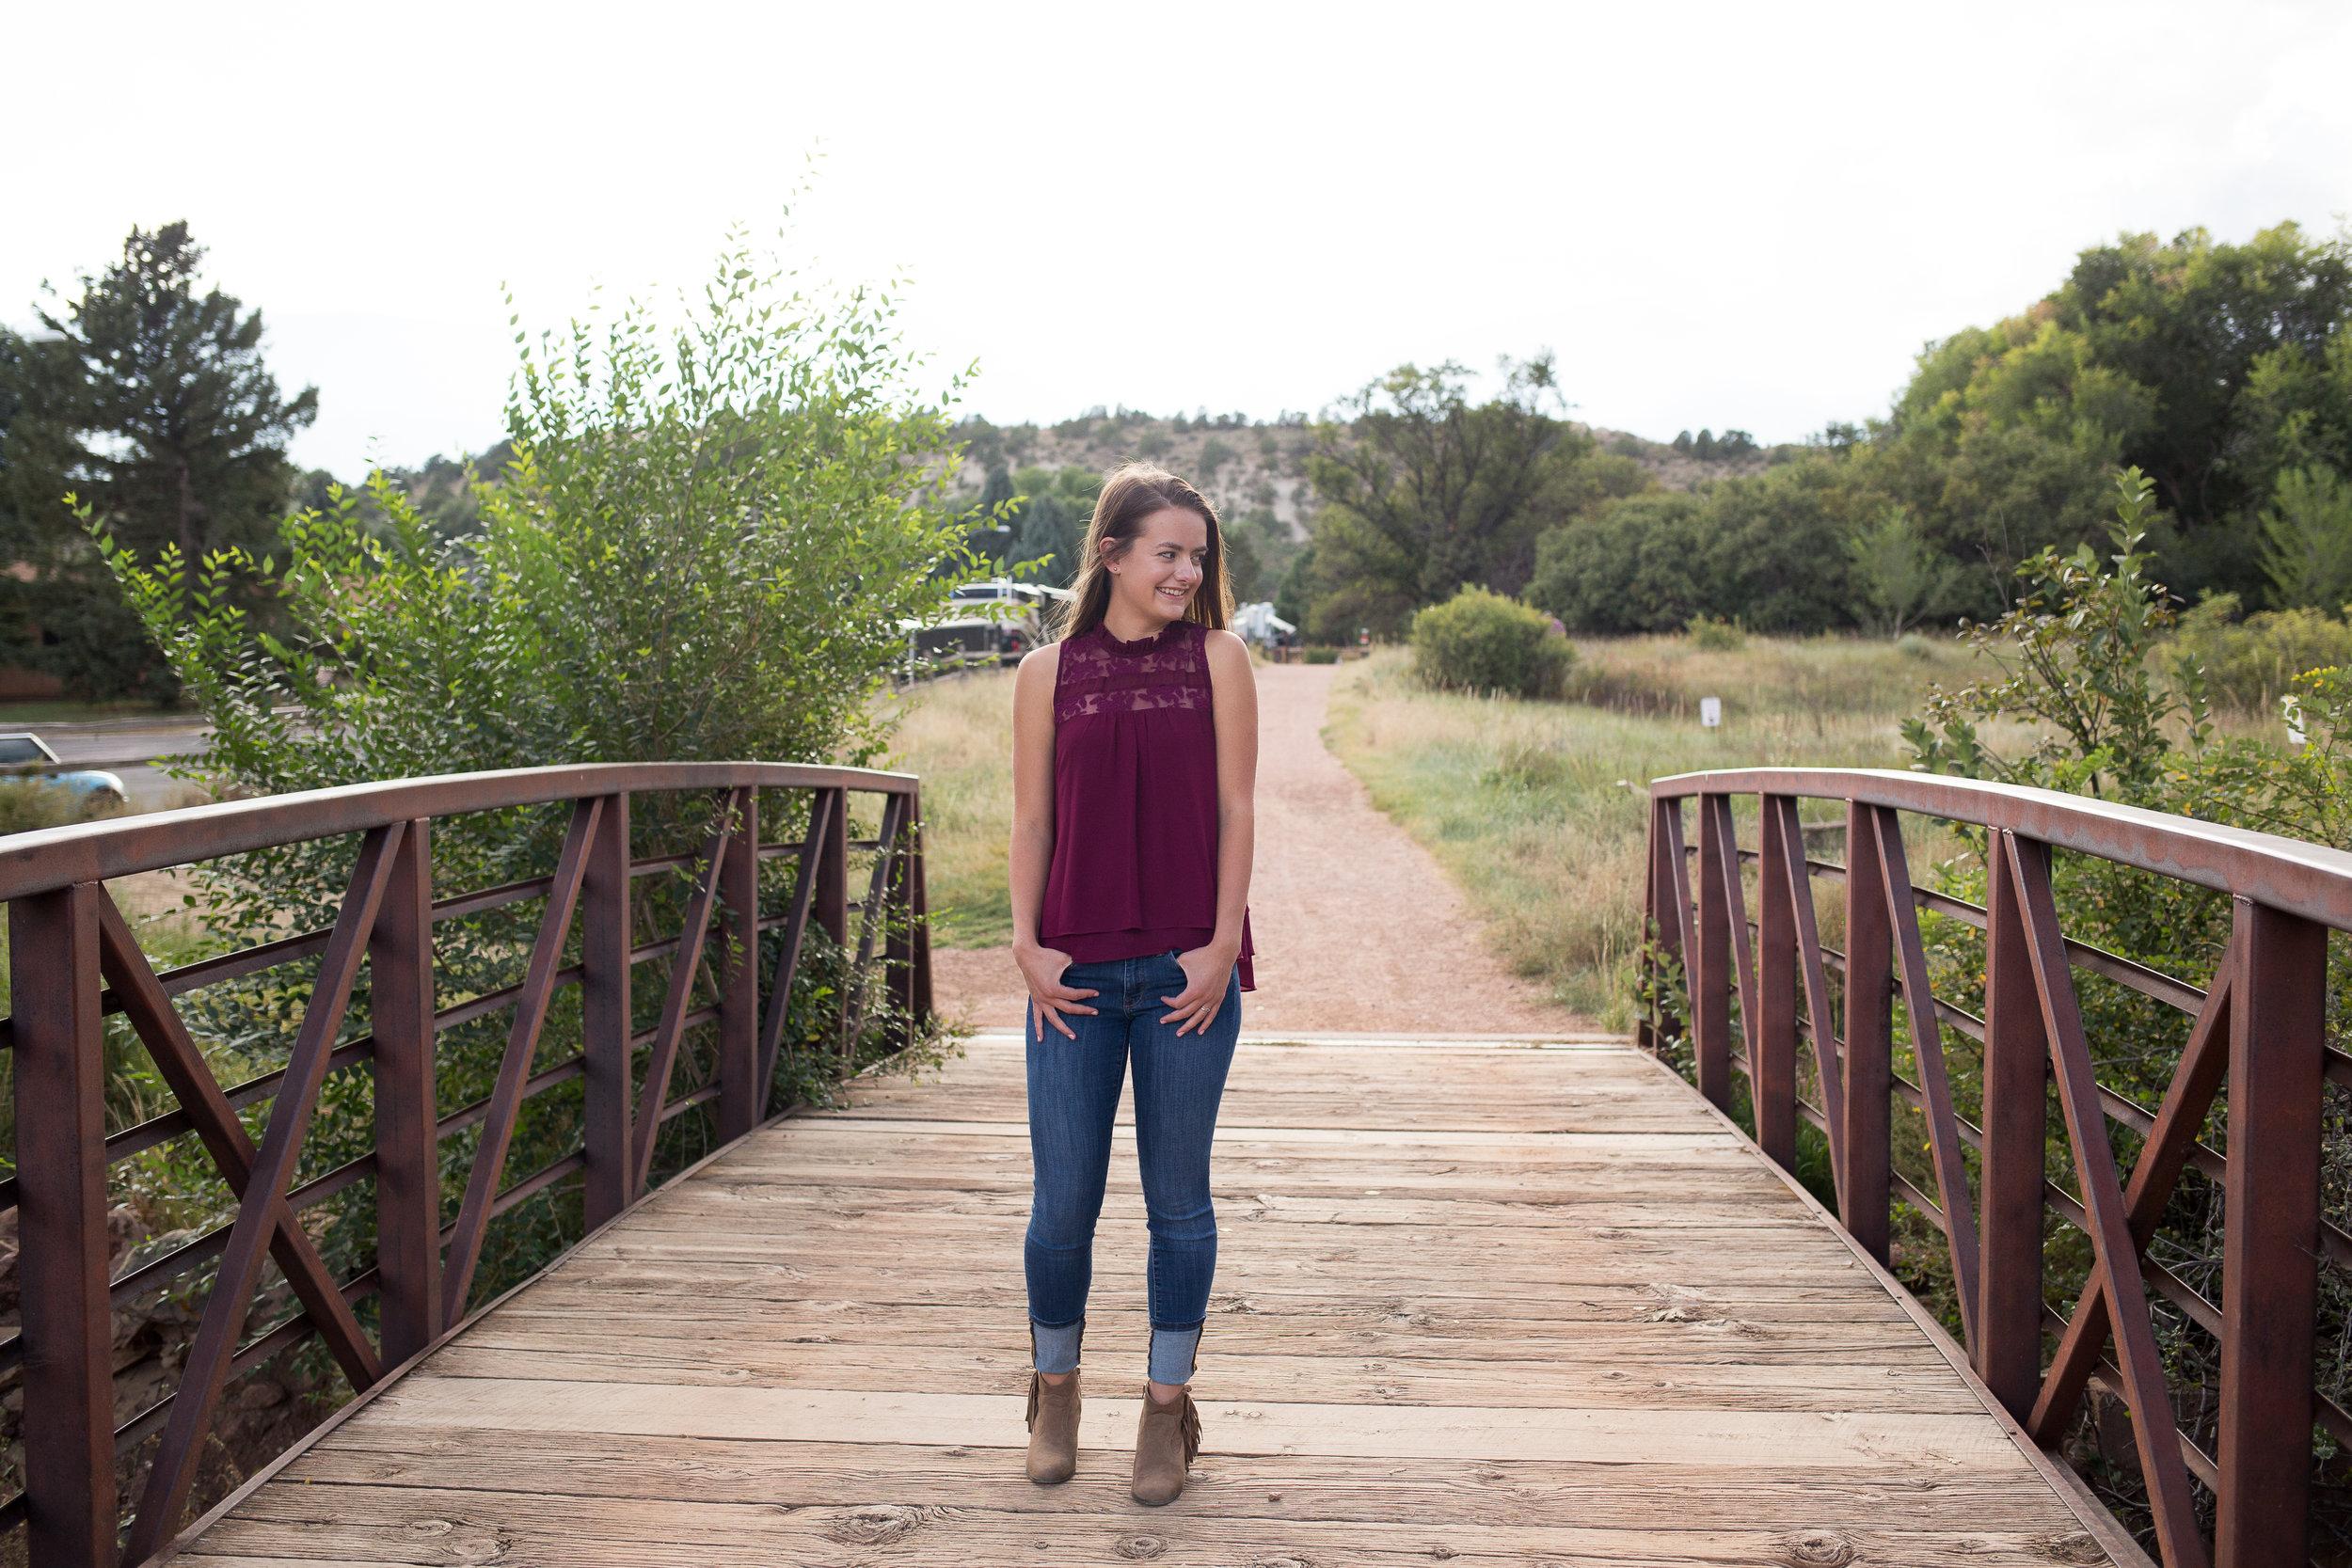 Colorado Springs Senior Photographer Stacy Carosa Photography Rock Ledge Ranch Senior Photos Session girl standing on bridge